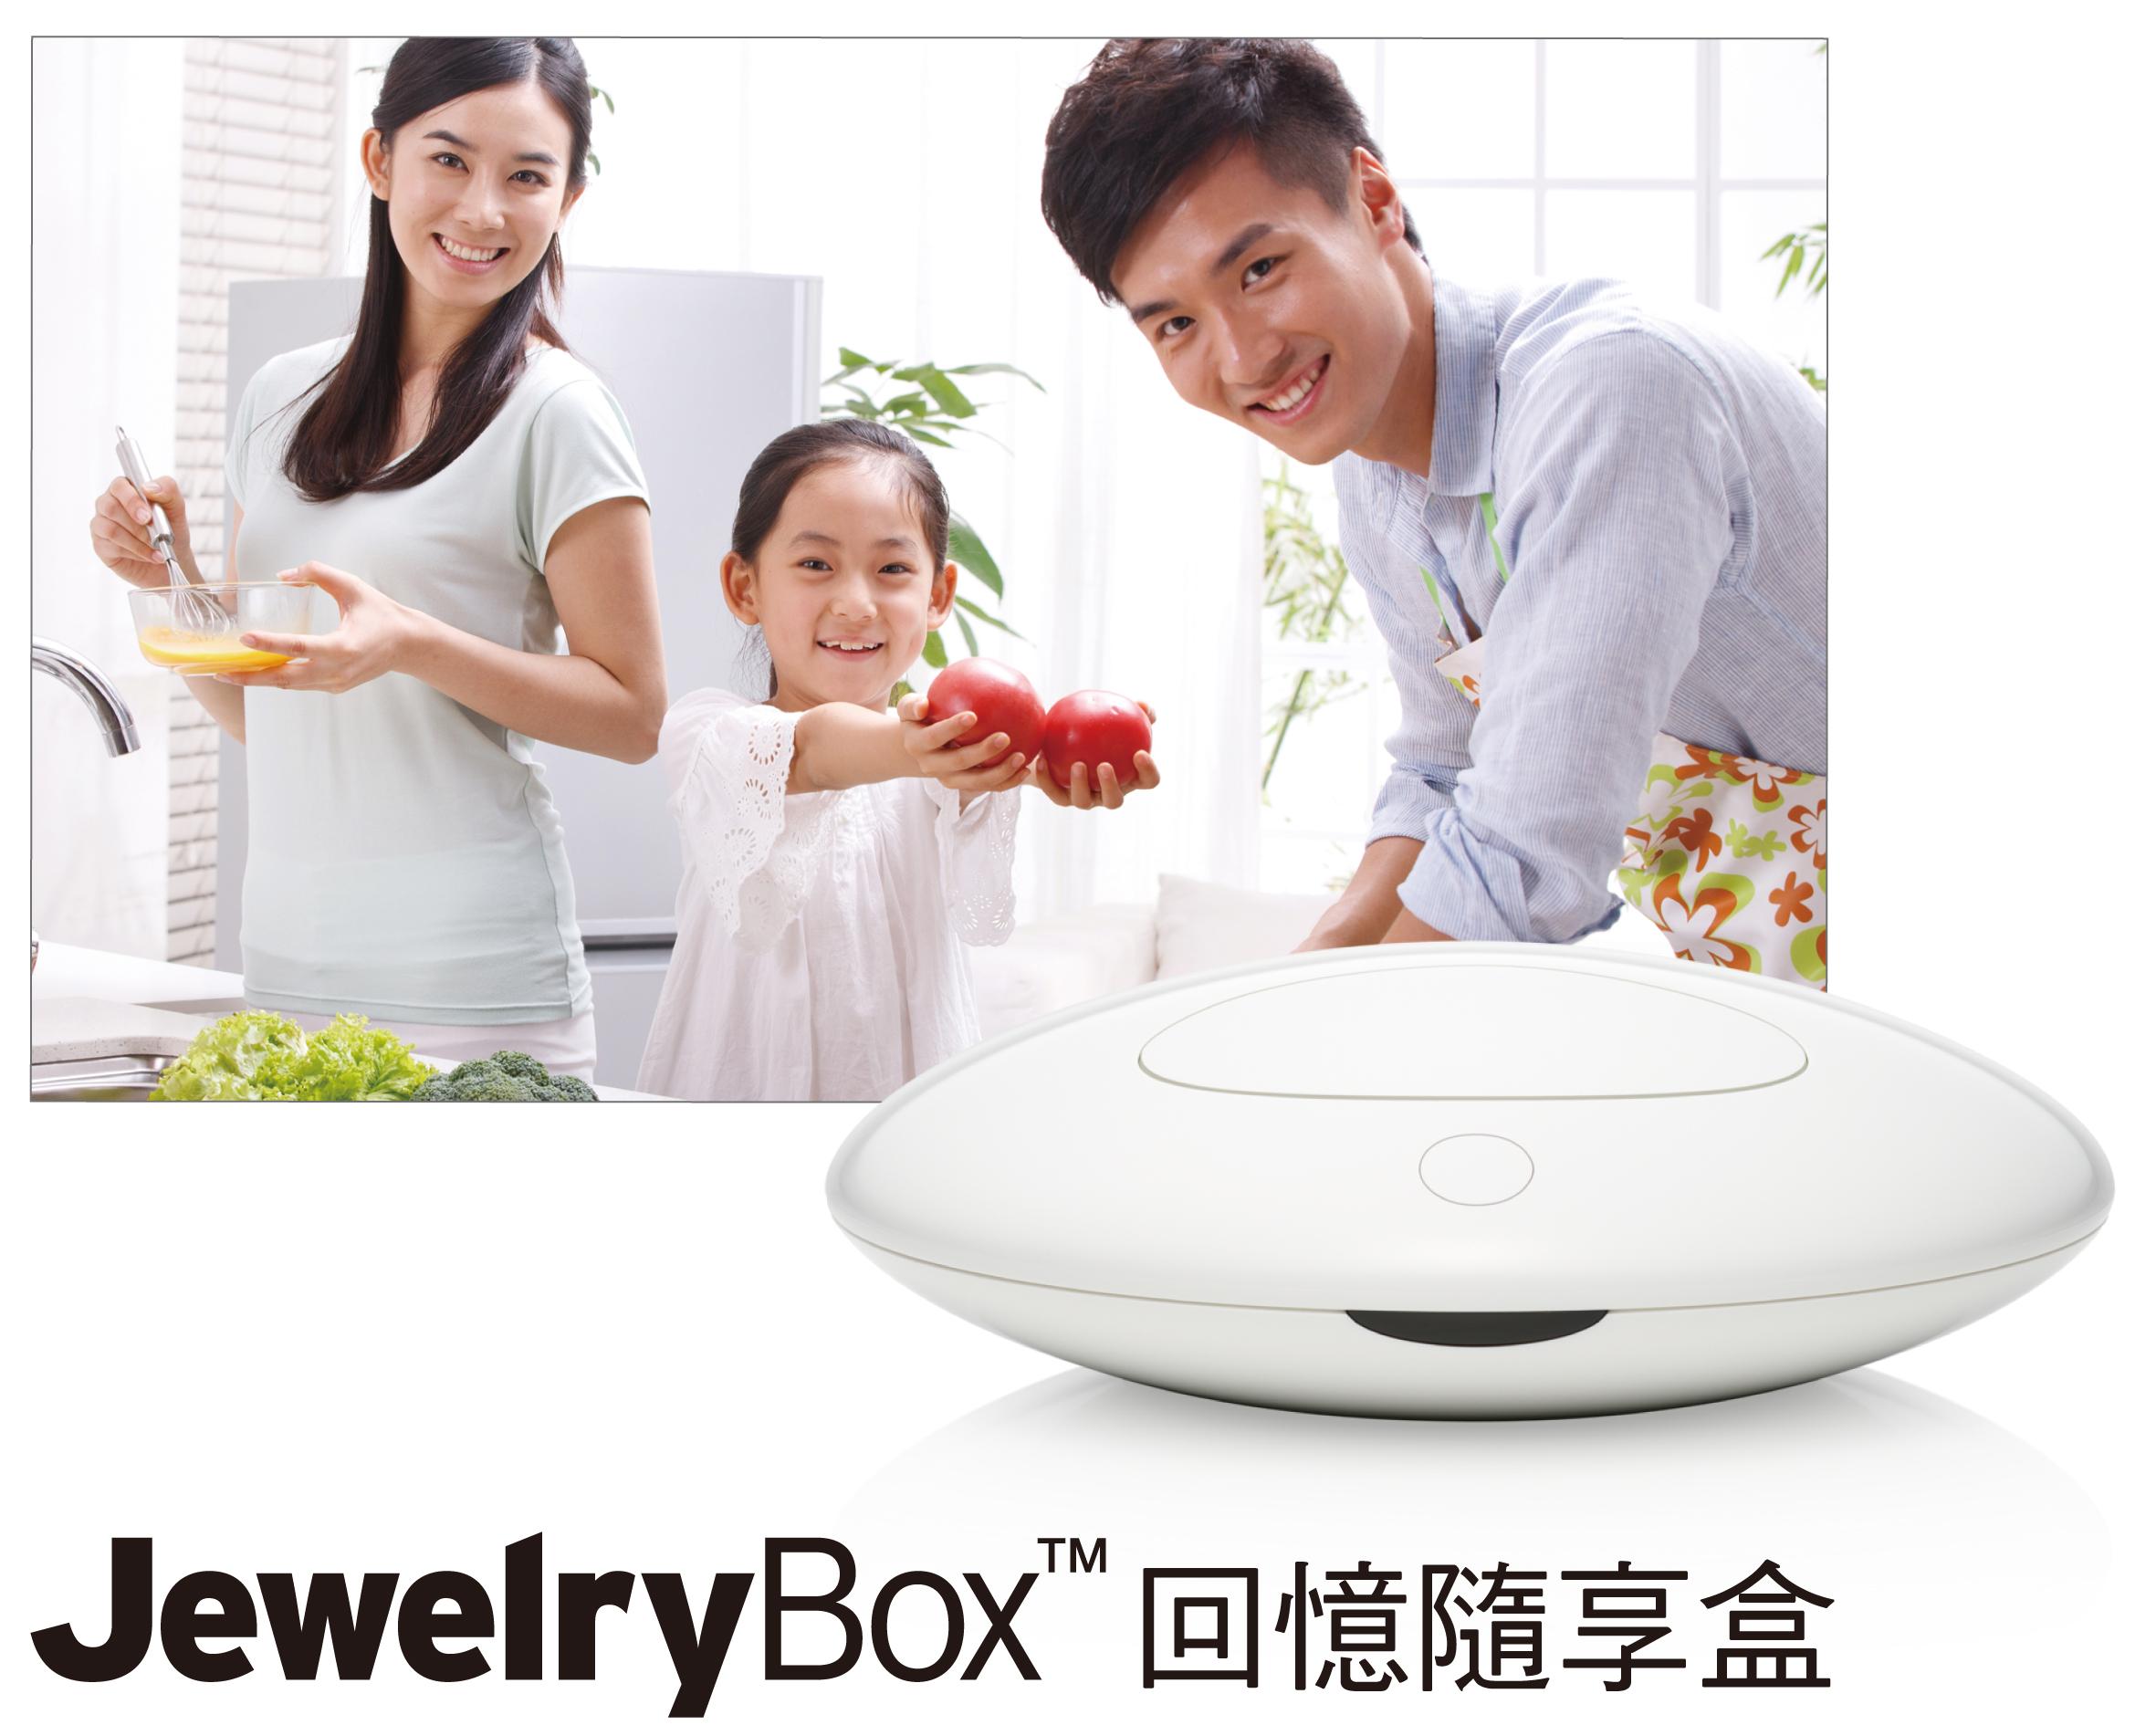 JewelryBox2 JB